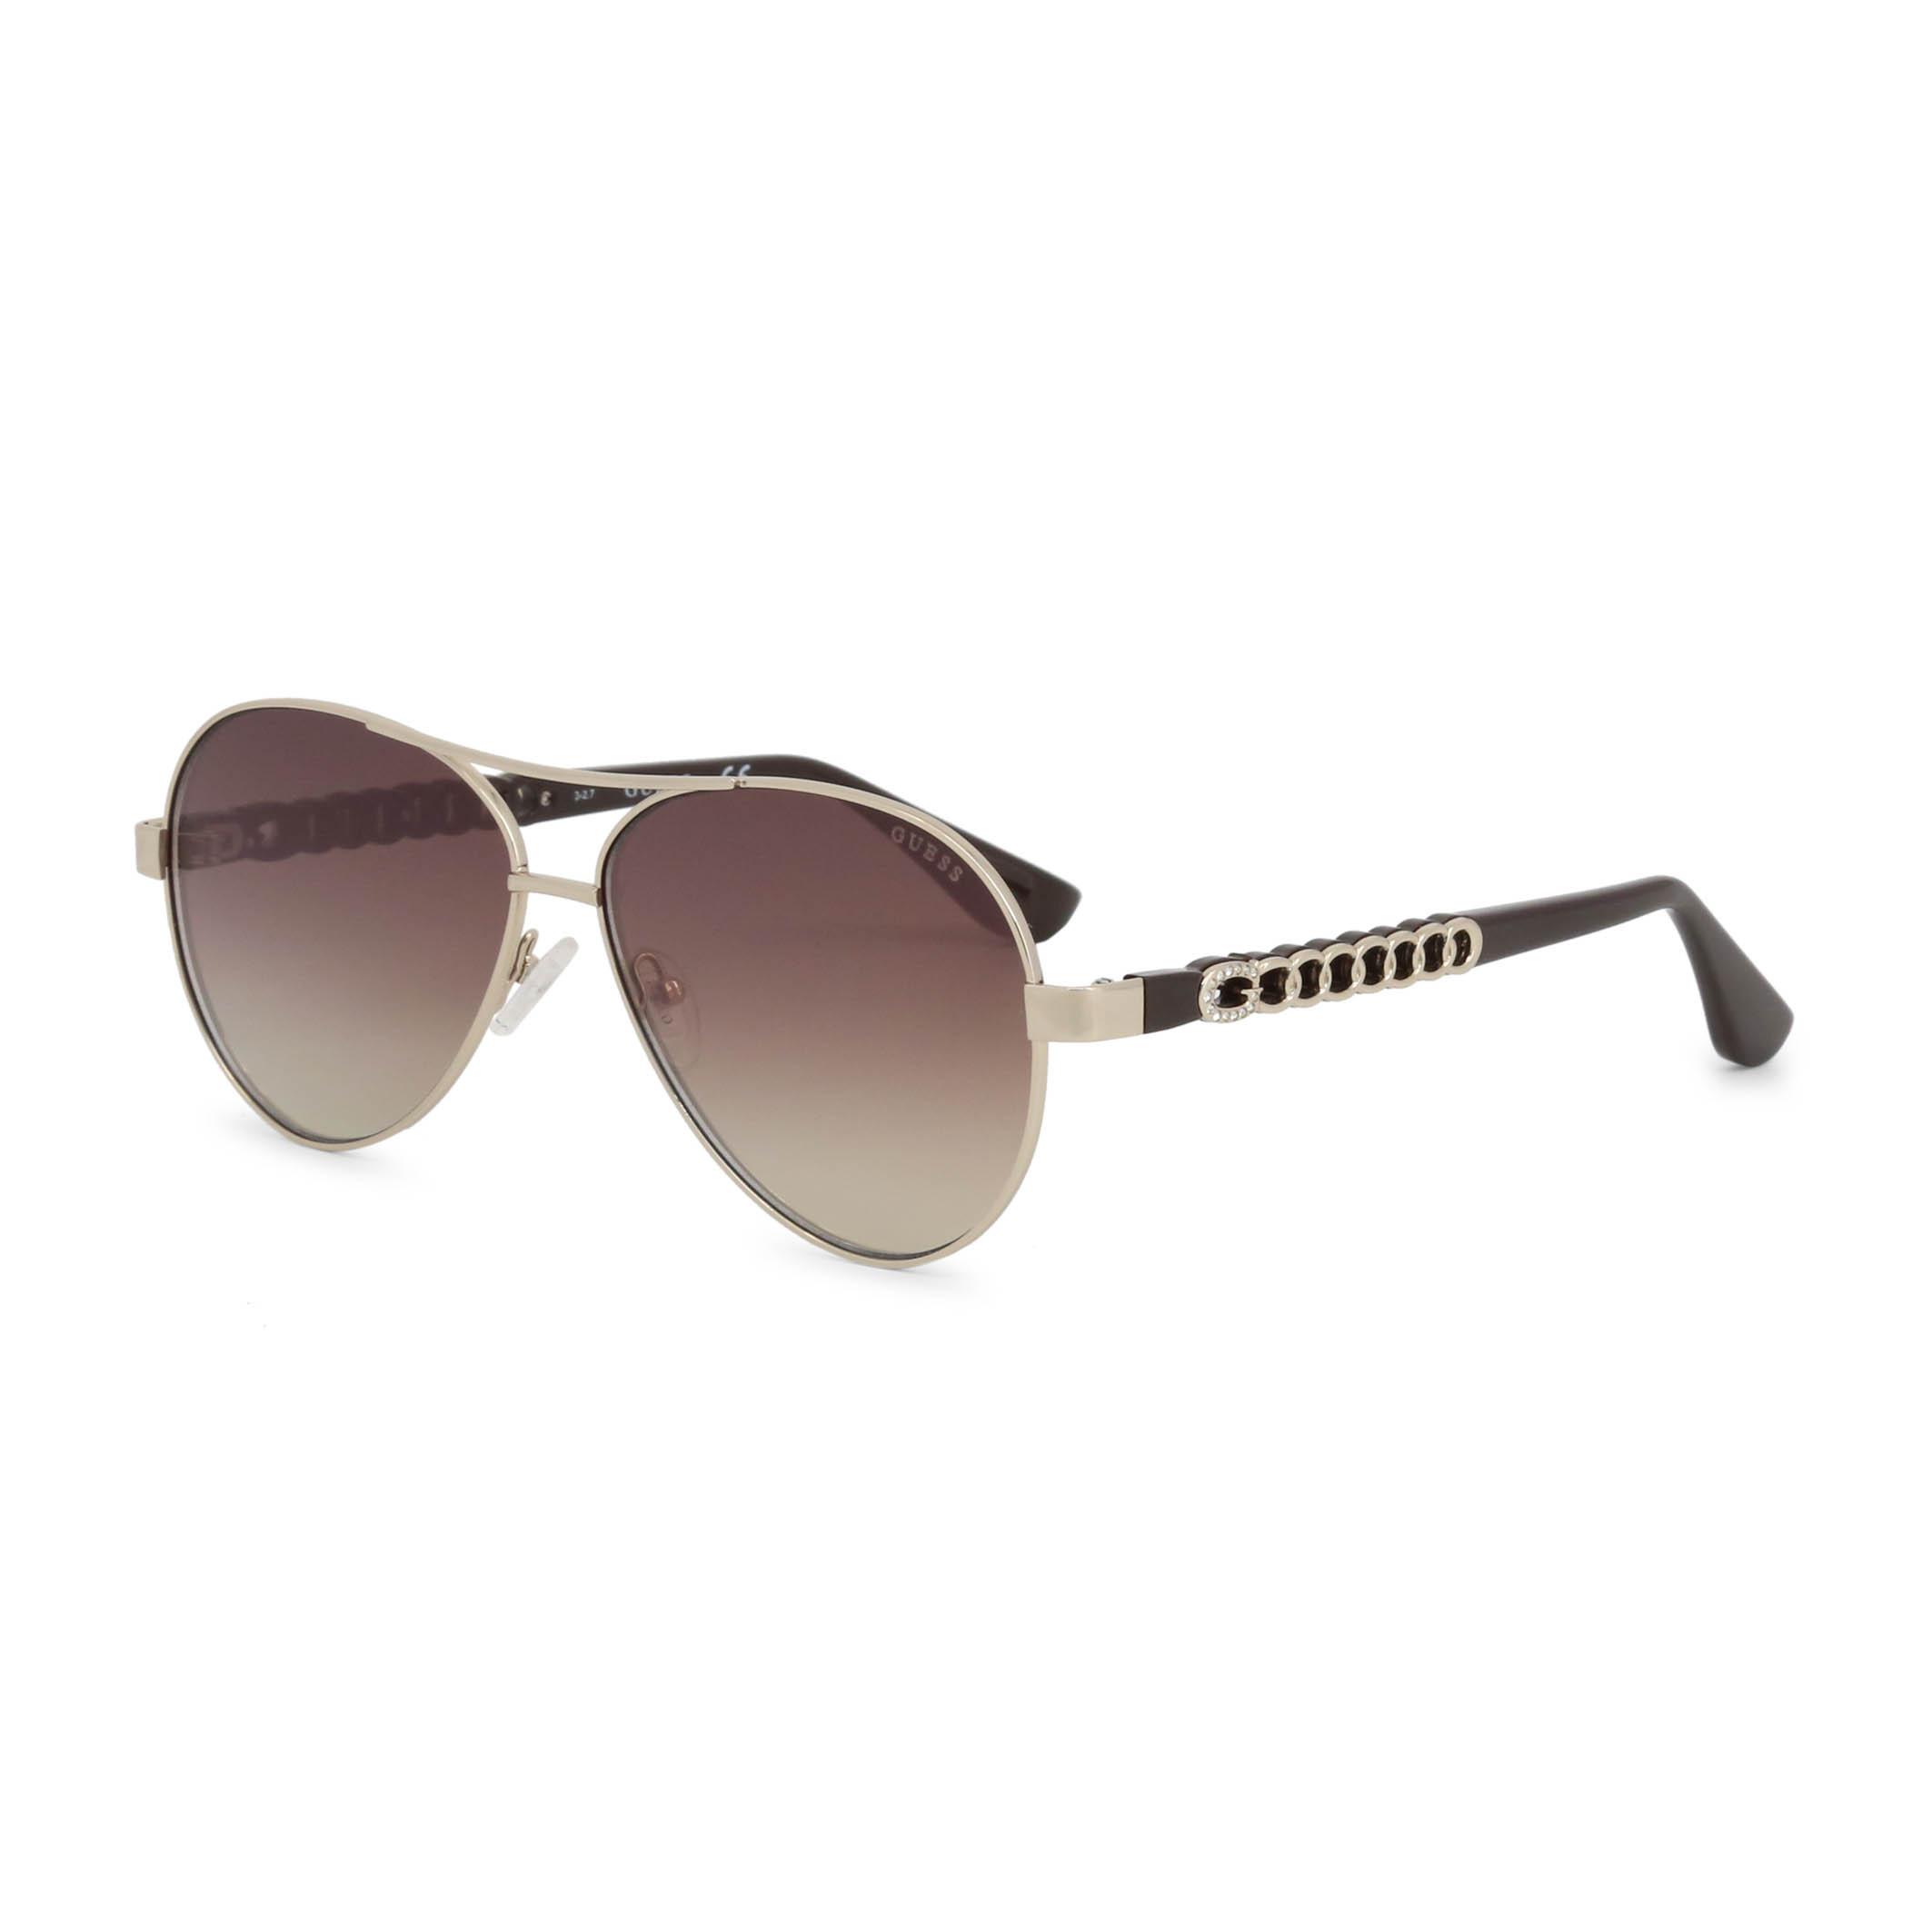 Guess-Unisex-Accessoires-moderne-Designer-Sonnenbrille-Sonnenbrillen-Gelb-Sungla